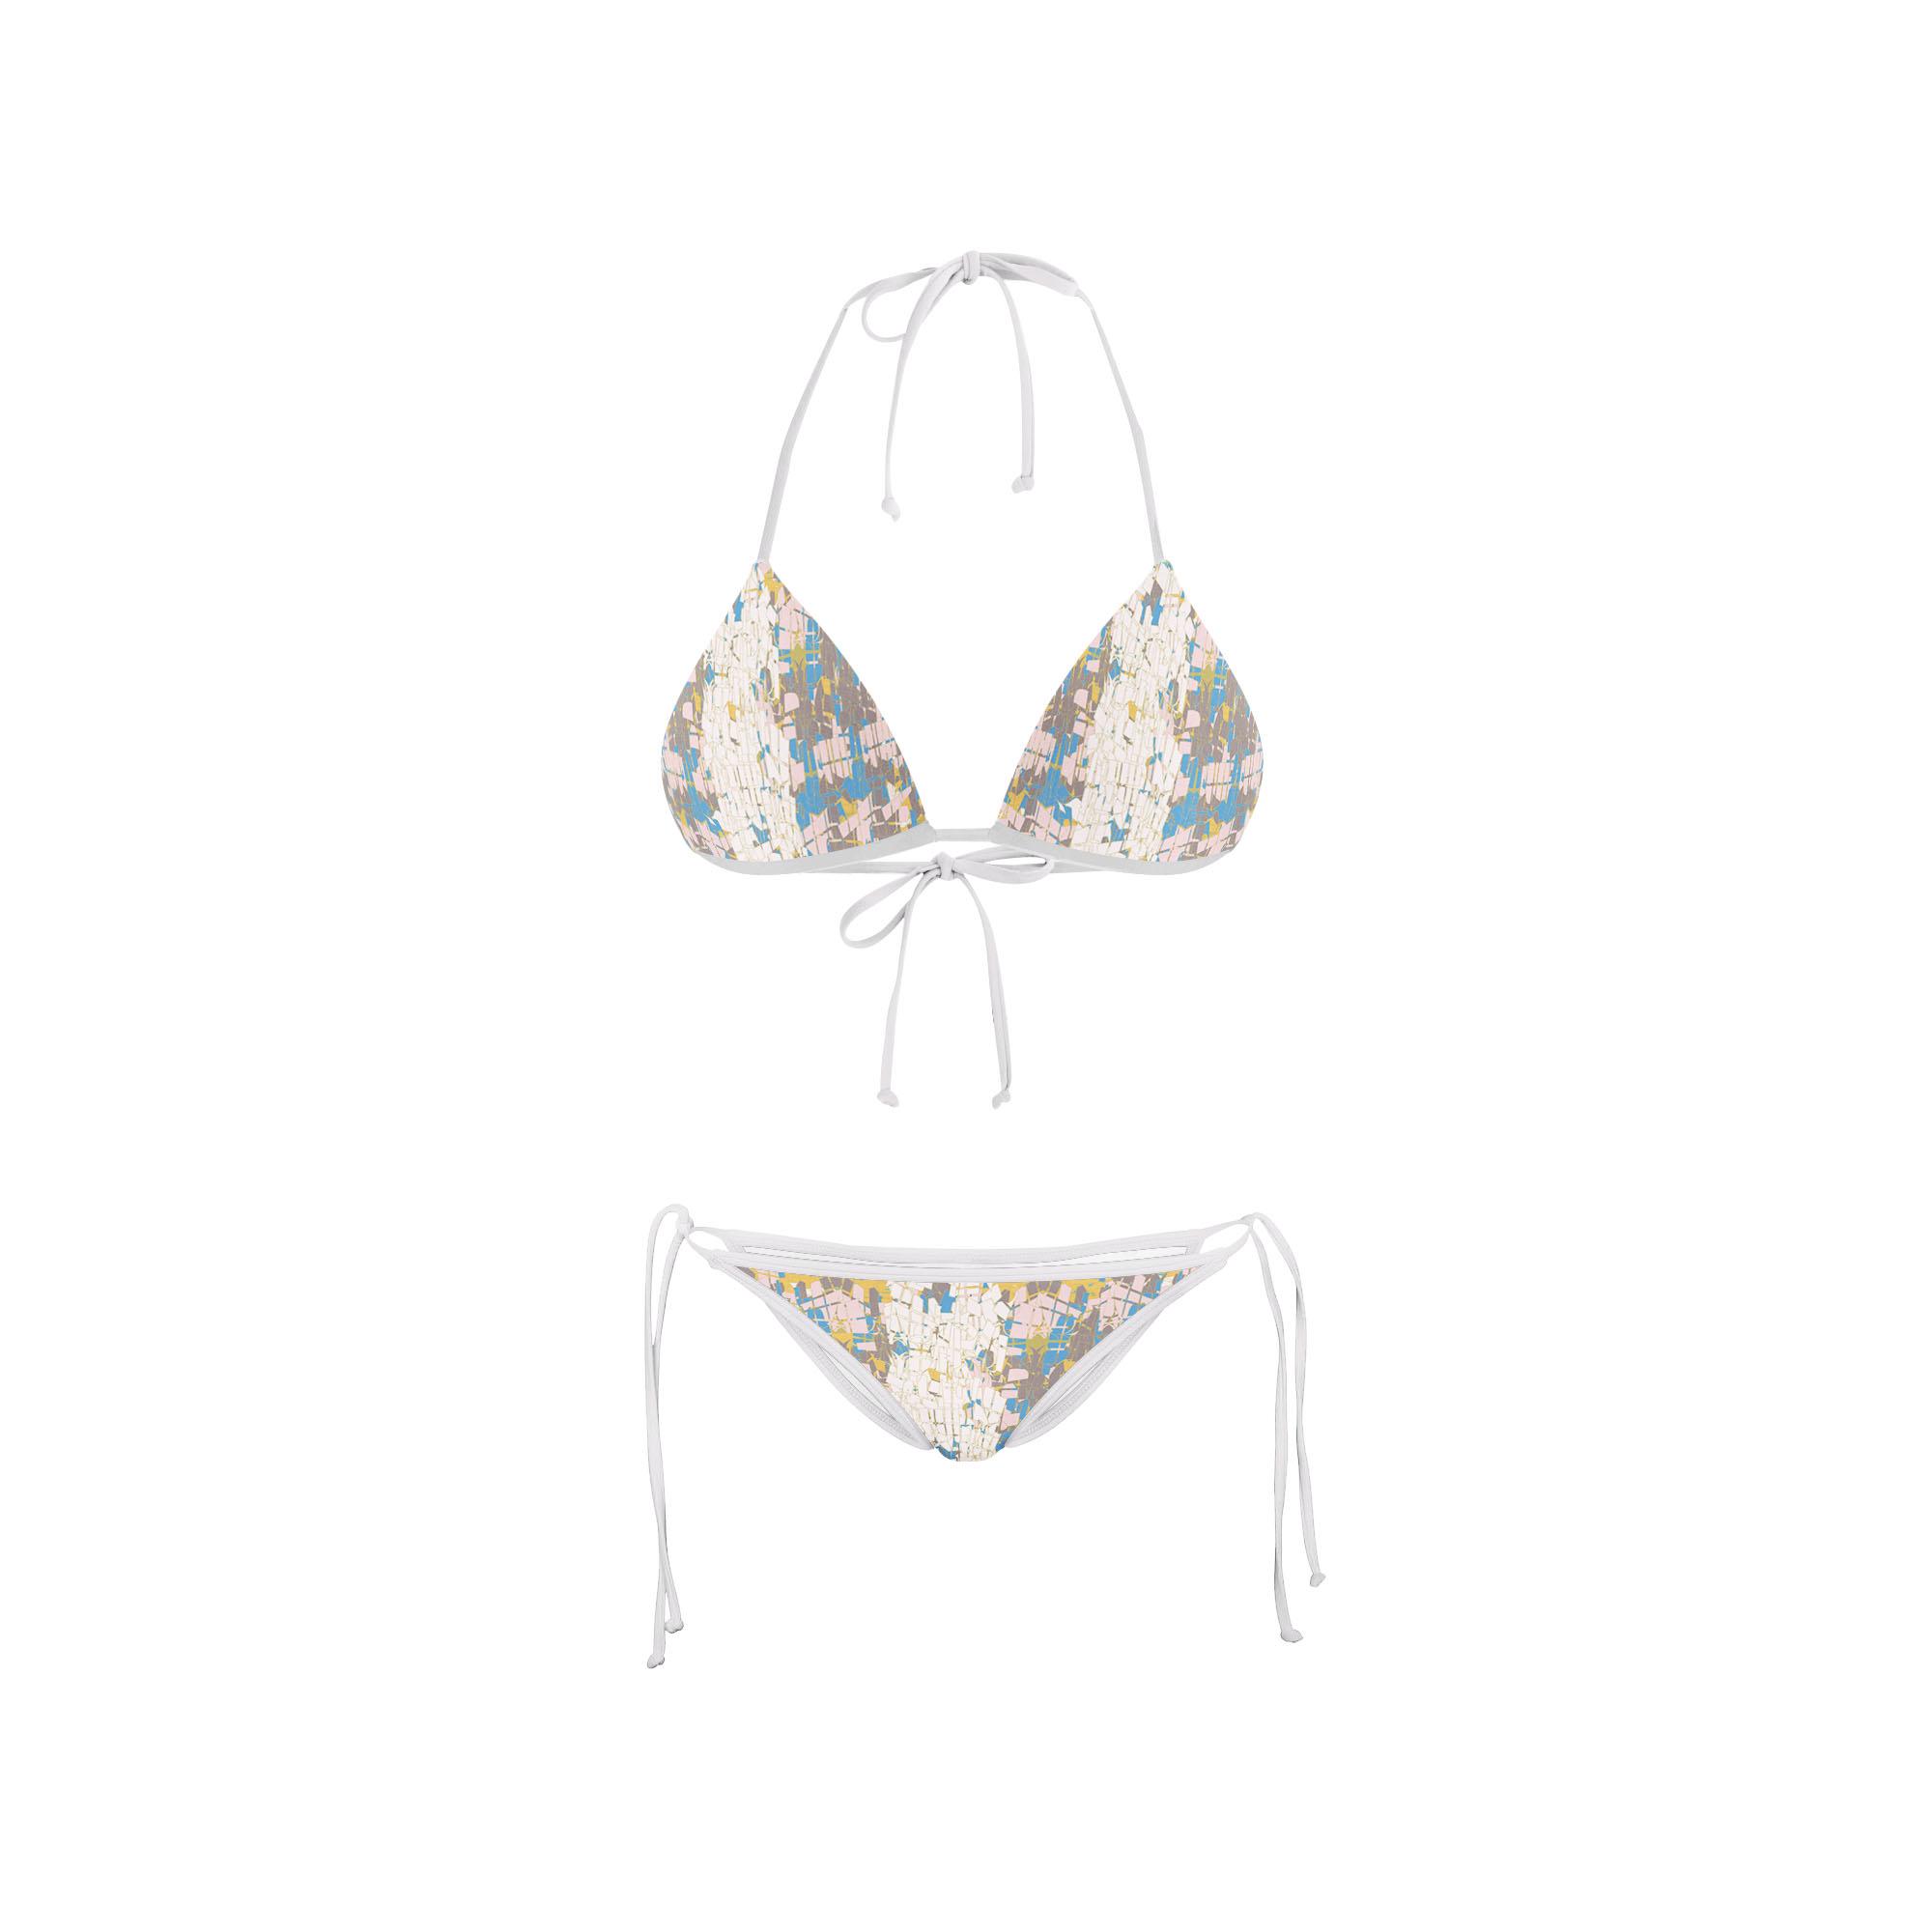 Bikini Front crackle abstract